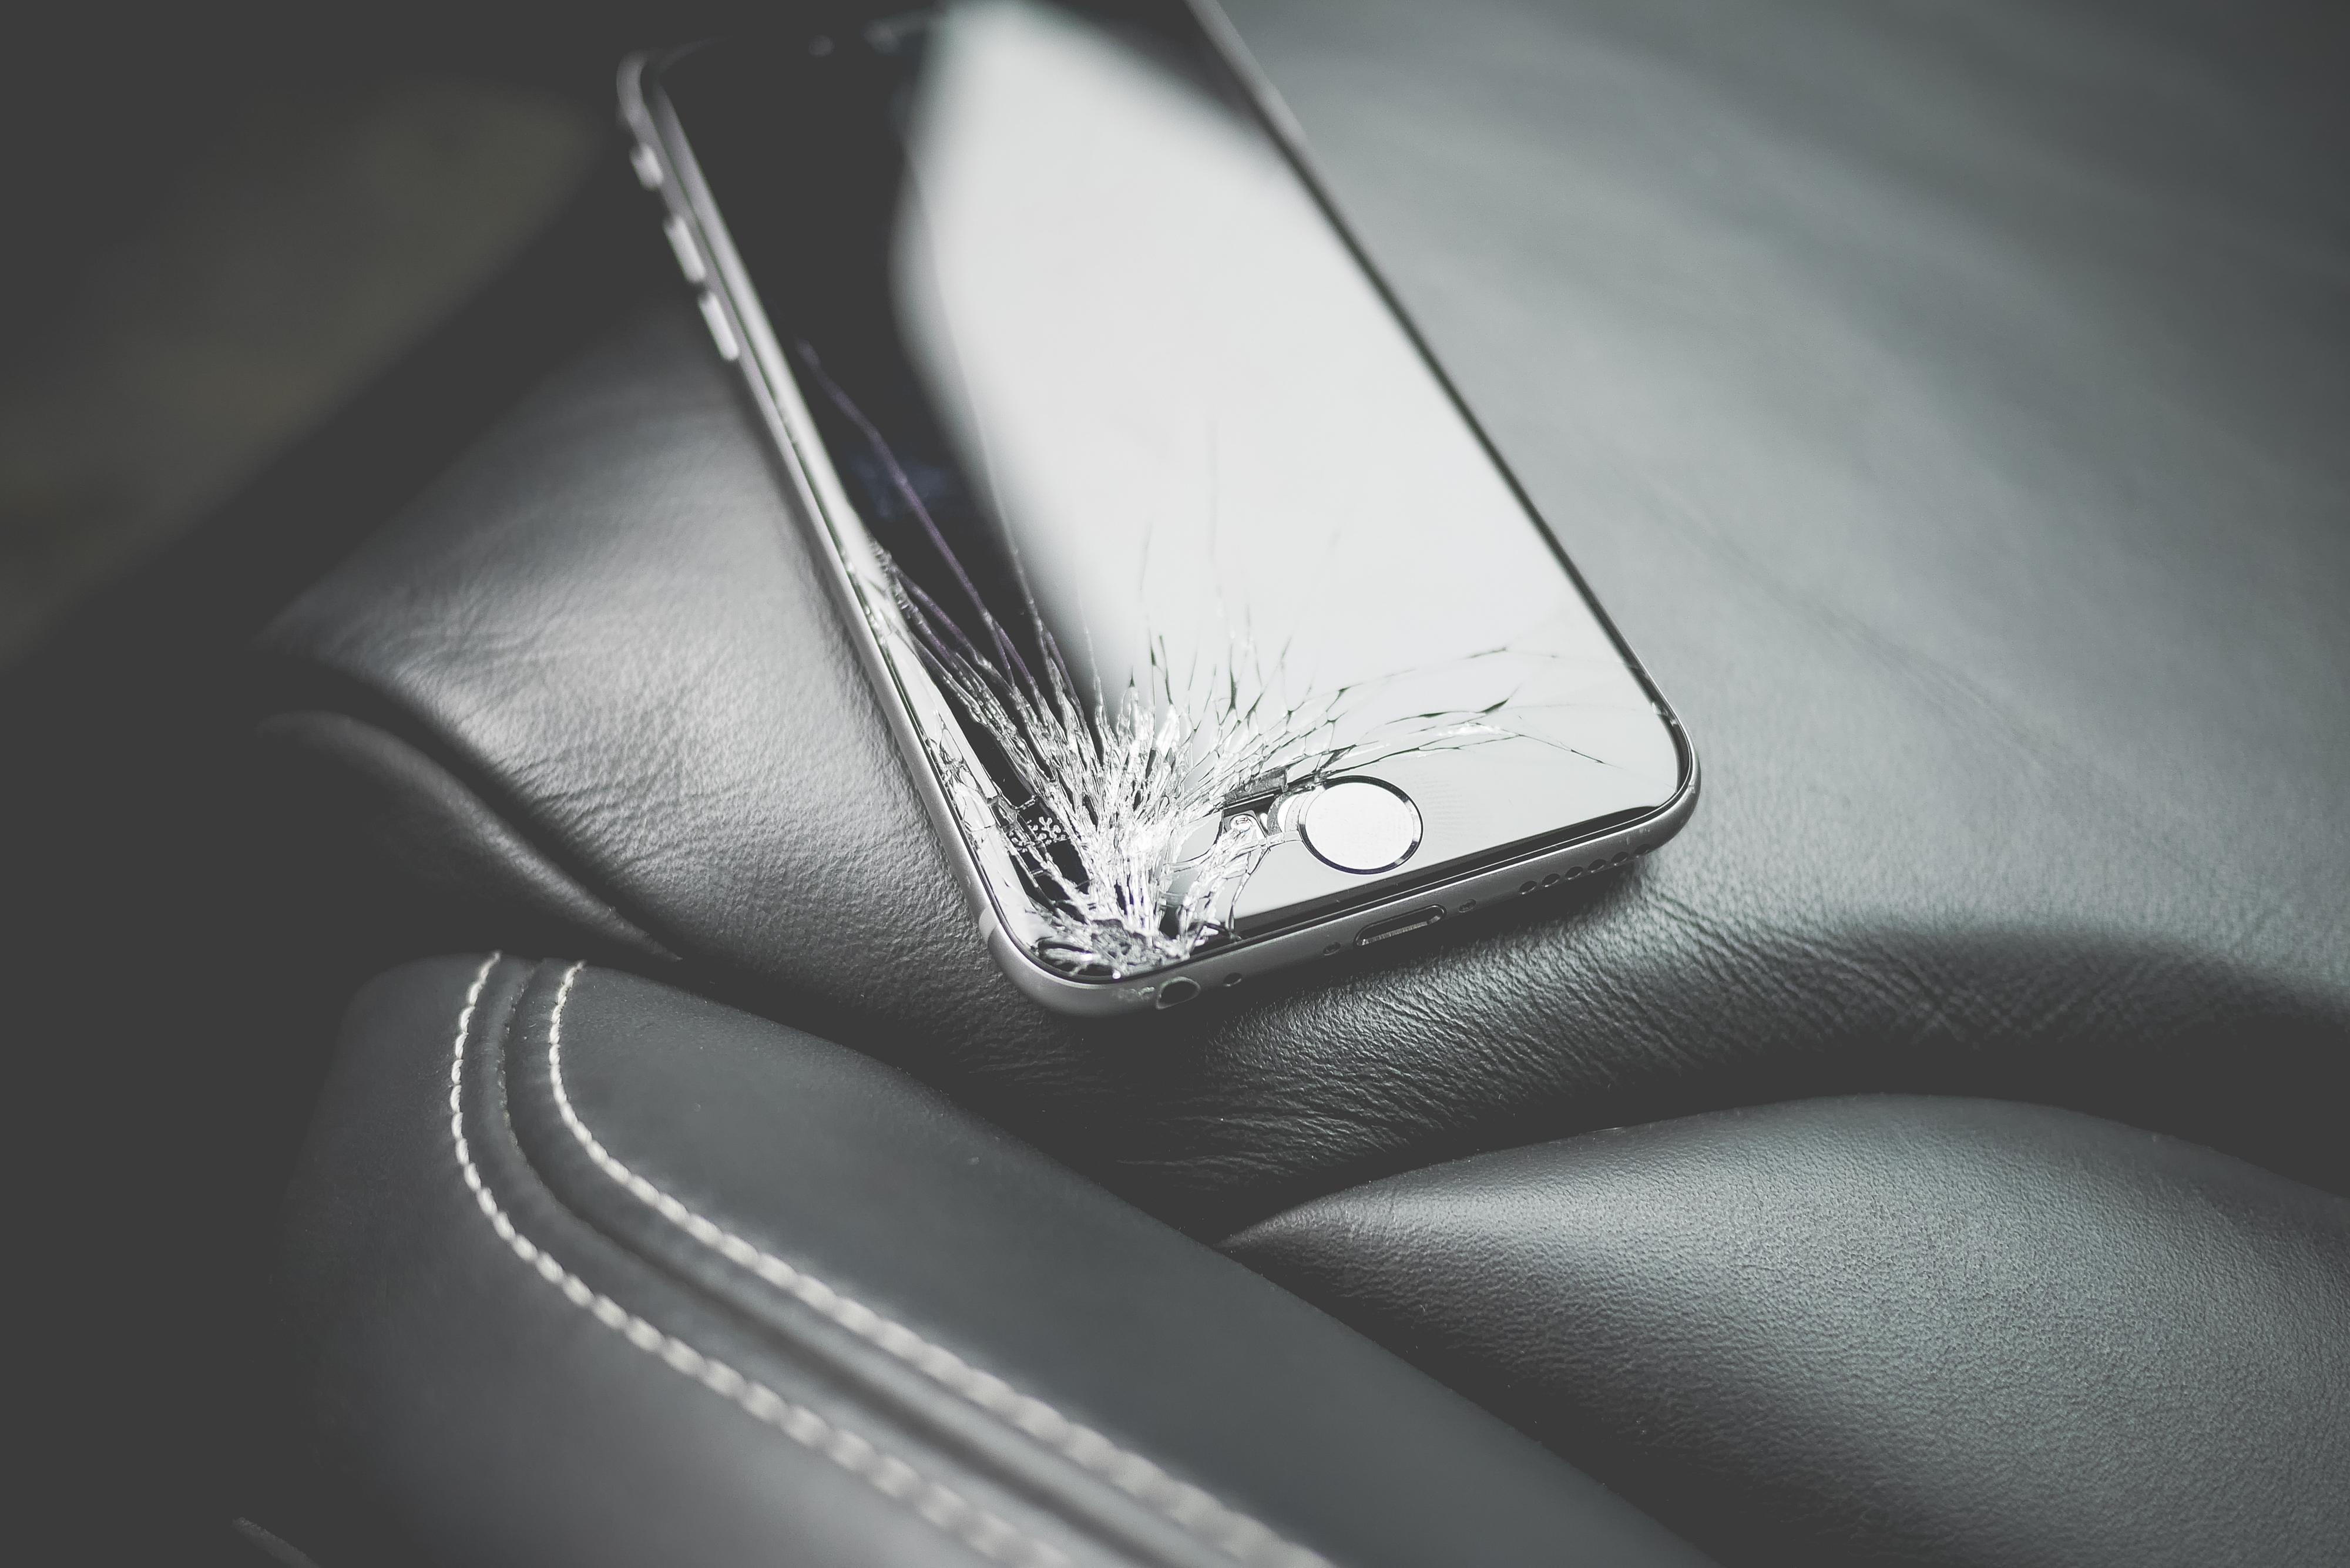 iphone schermo rotto